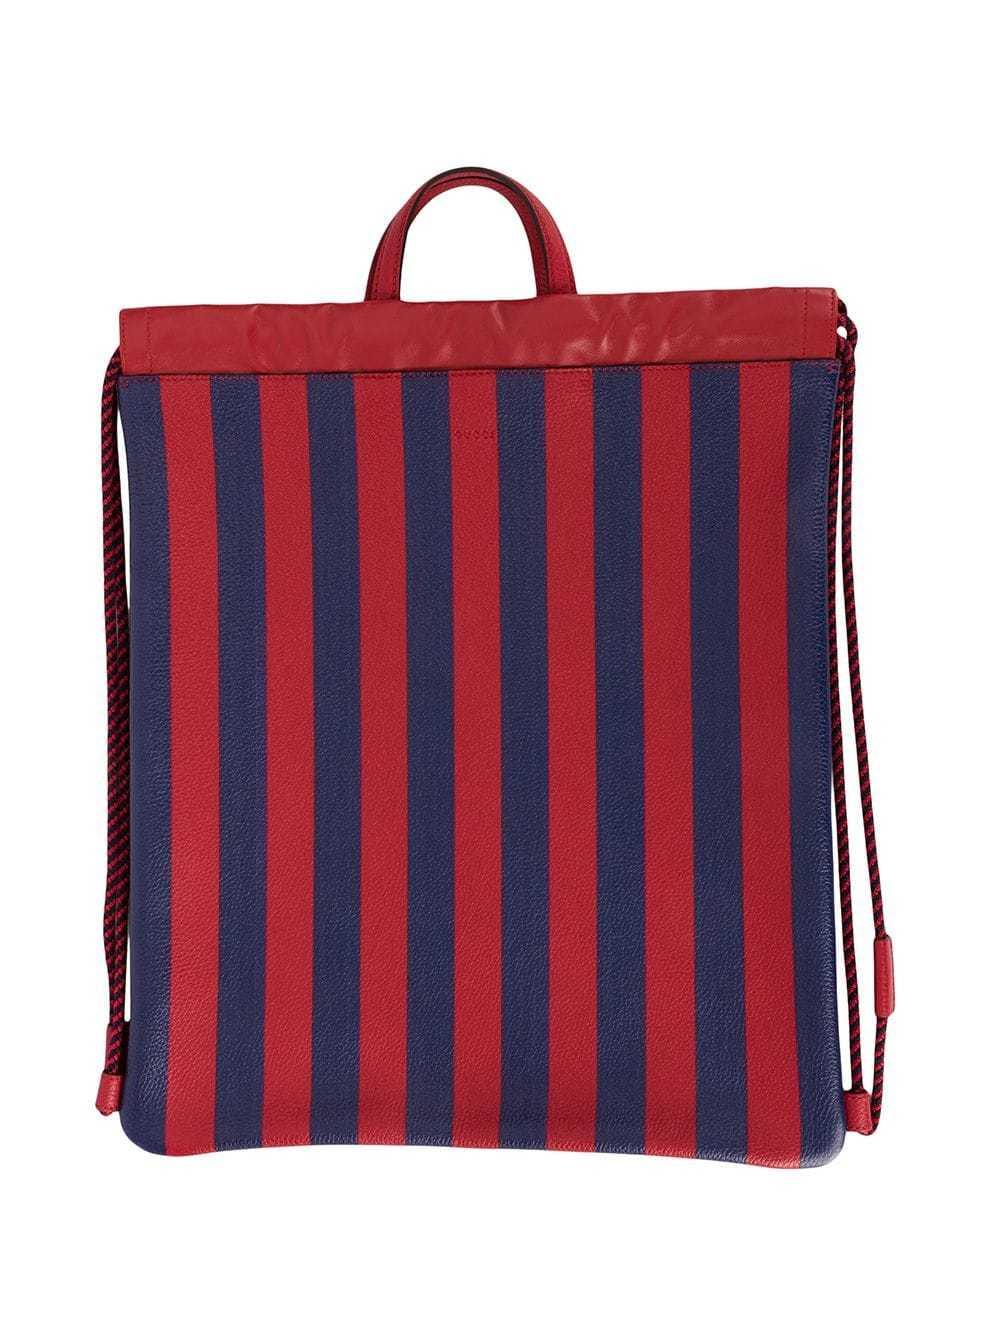 fb0b95cda045 Gucci Snake Drawstring Backpack, $1,674 | farfetch.com | Lookastic.com